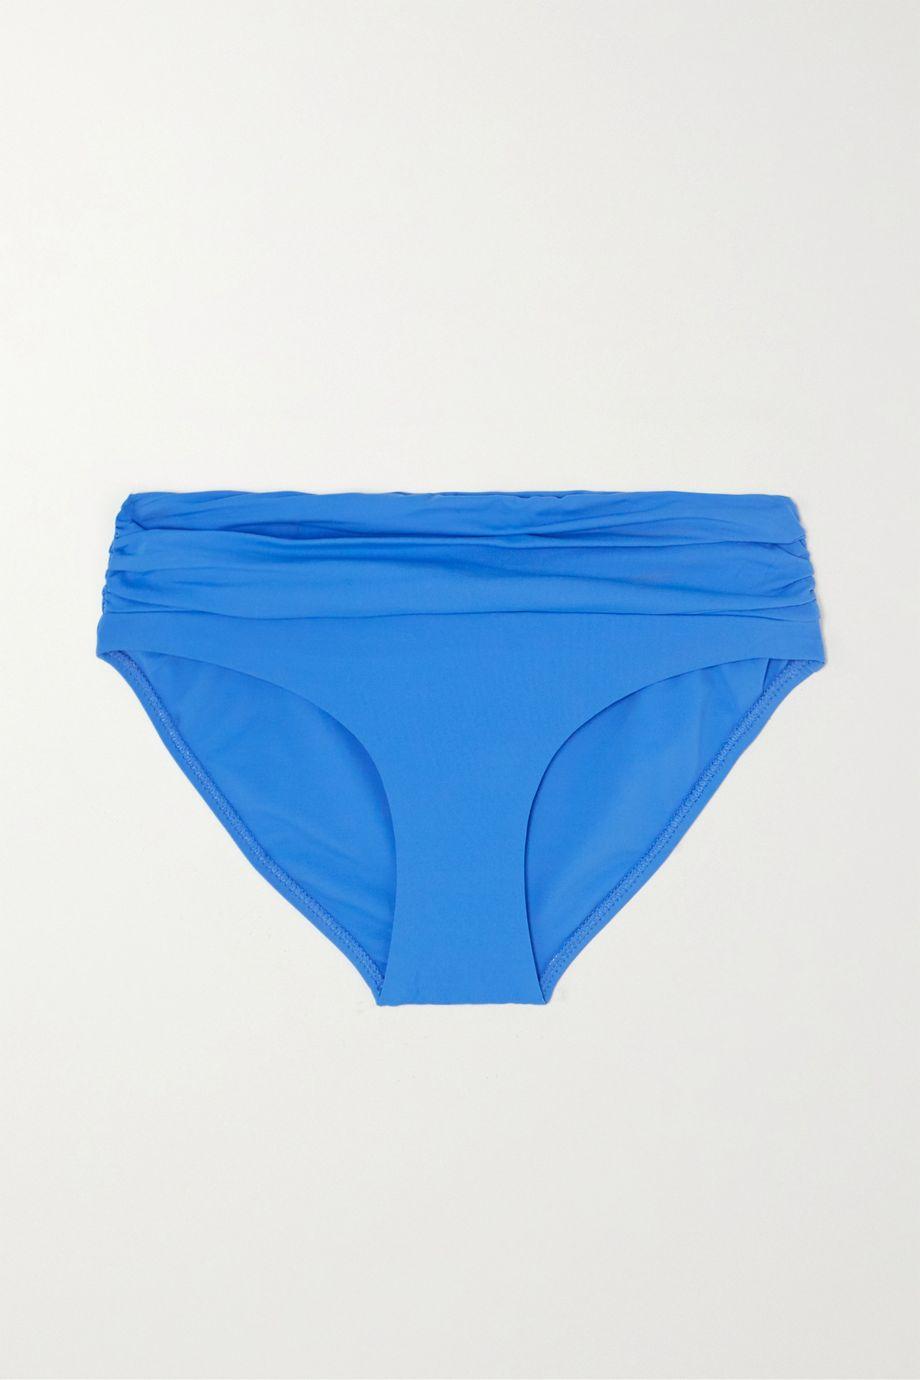 Melissa Odabash Bel Air ruched bikini briefs